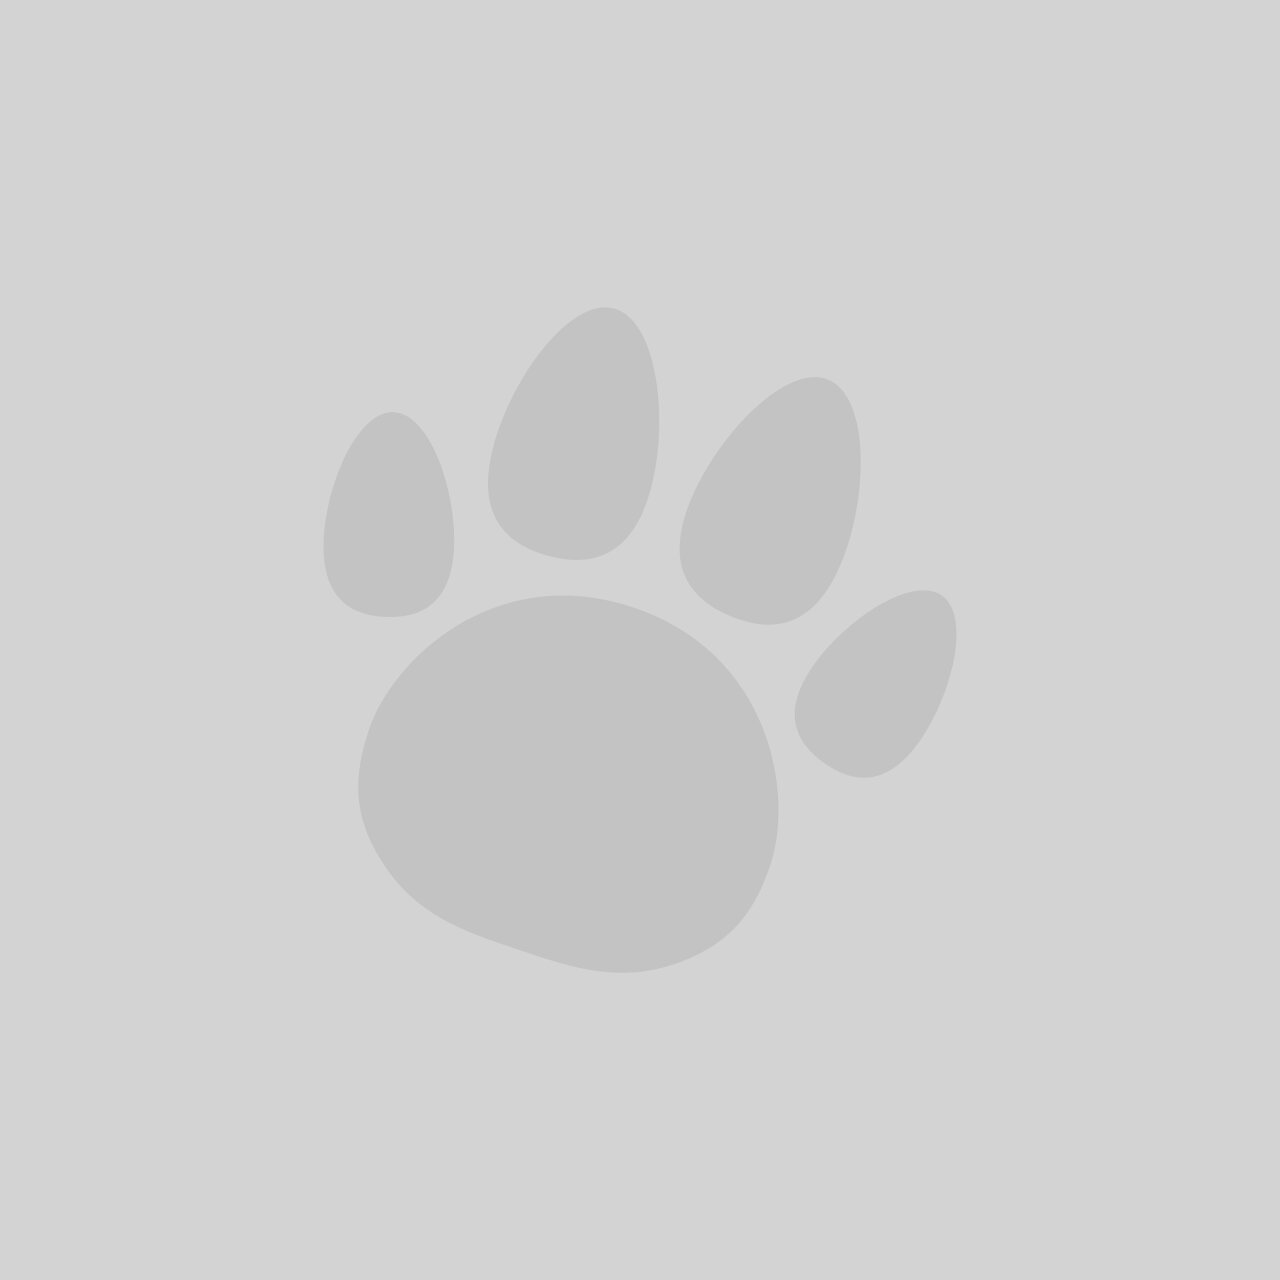 Pedigree Dentastix for Small Dogs 56 pack